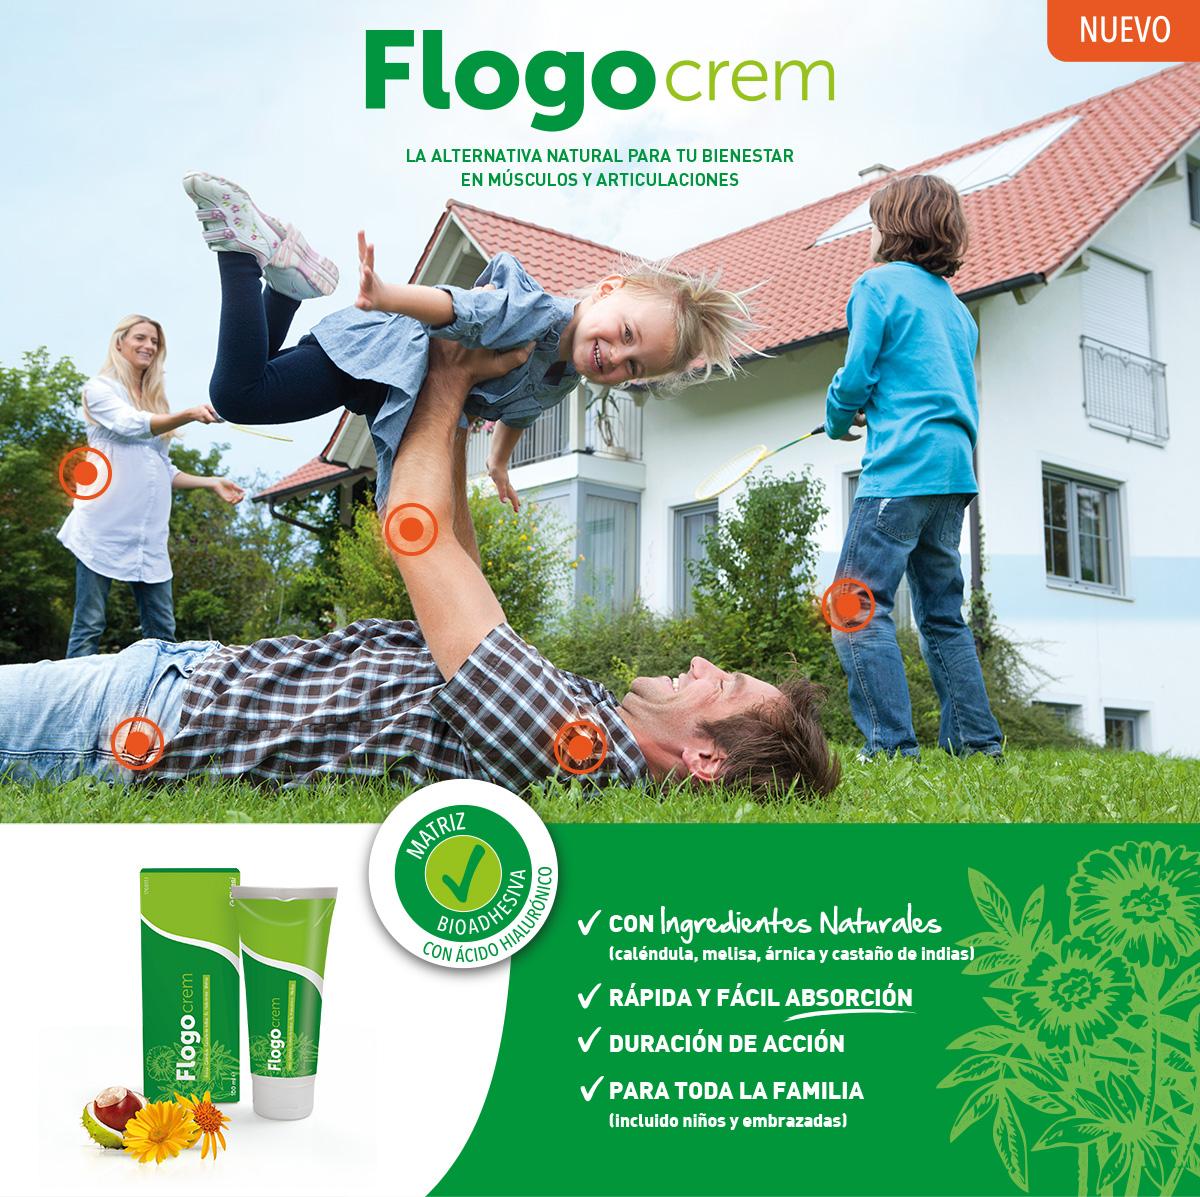 flogocrem poster